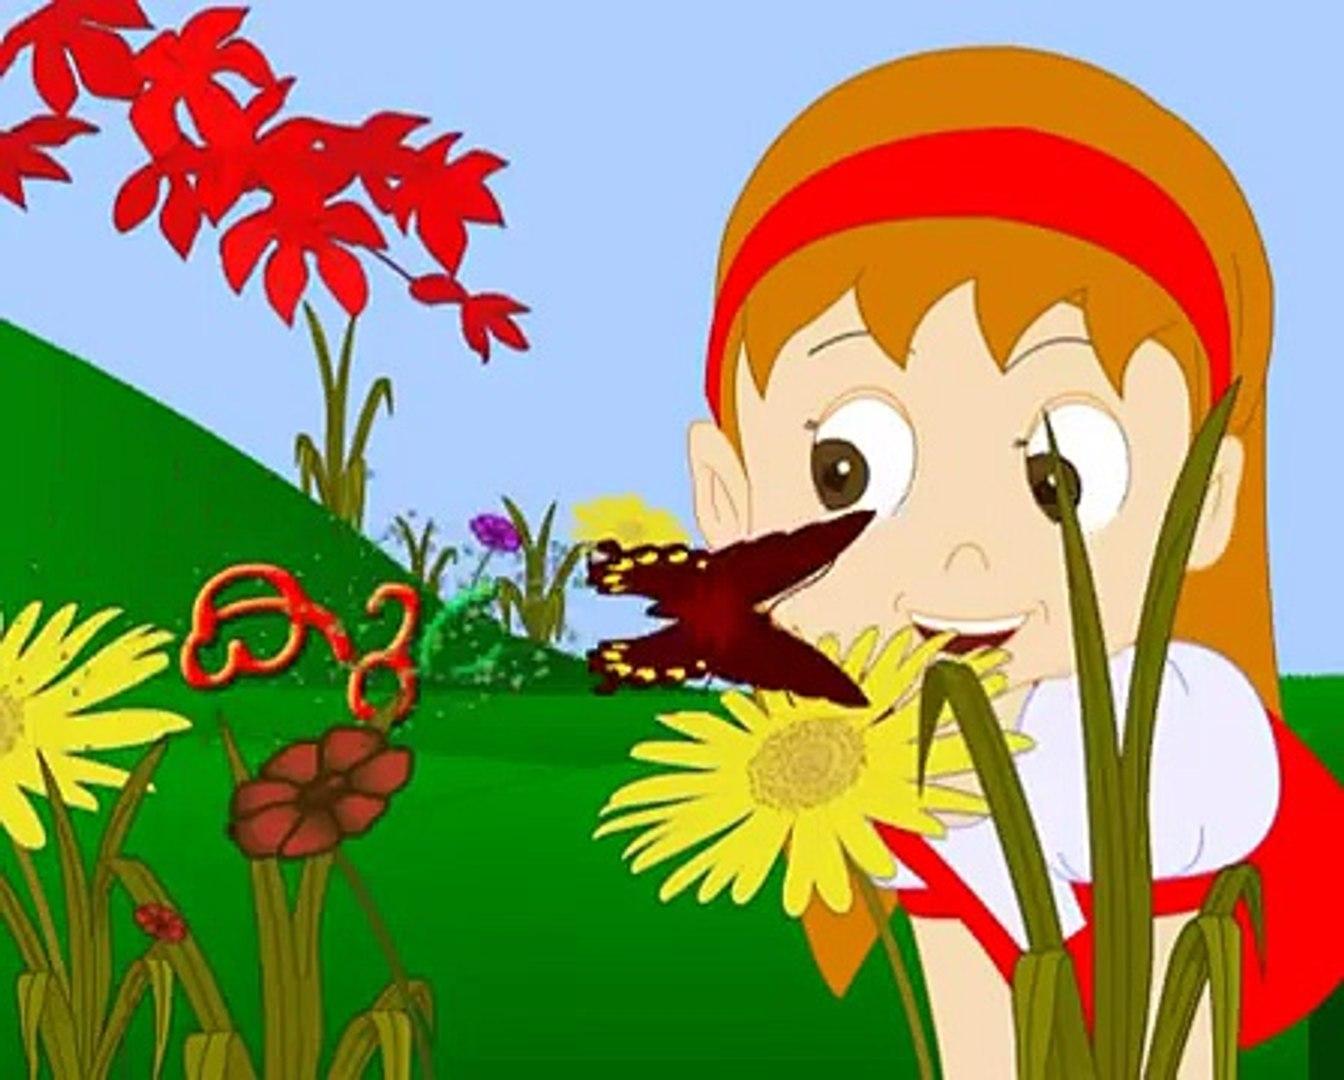 Kunjatta Trailer - 2D cartoon animation film for kids by BMG Animations